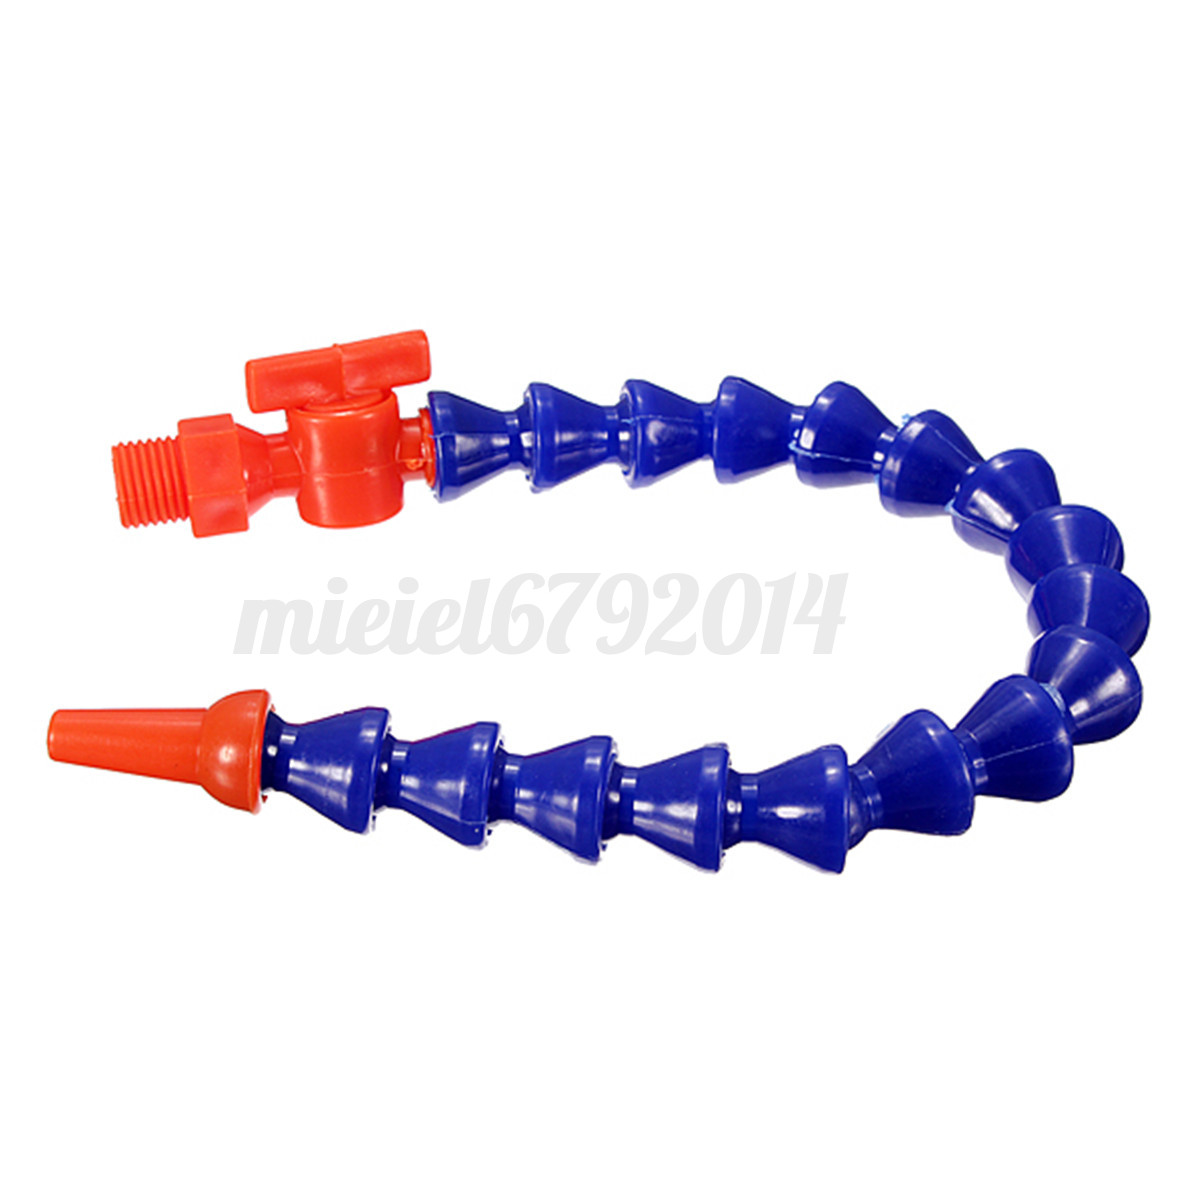 Pcs flexible plastic water oil coolant pipe hose for